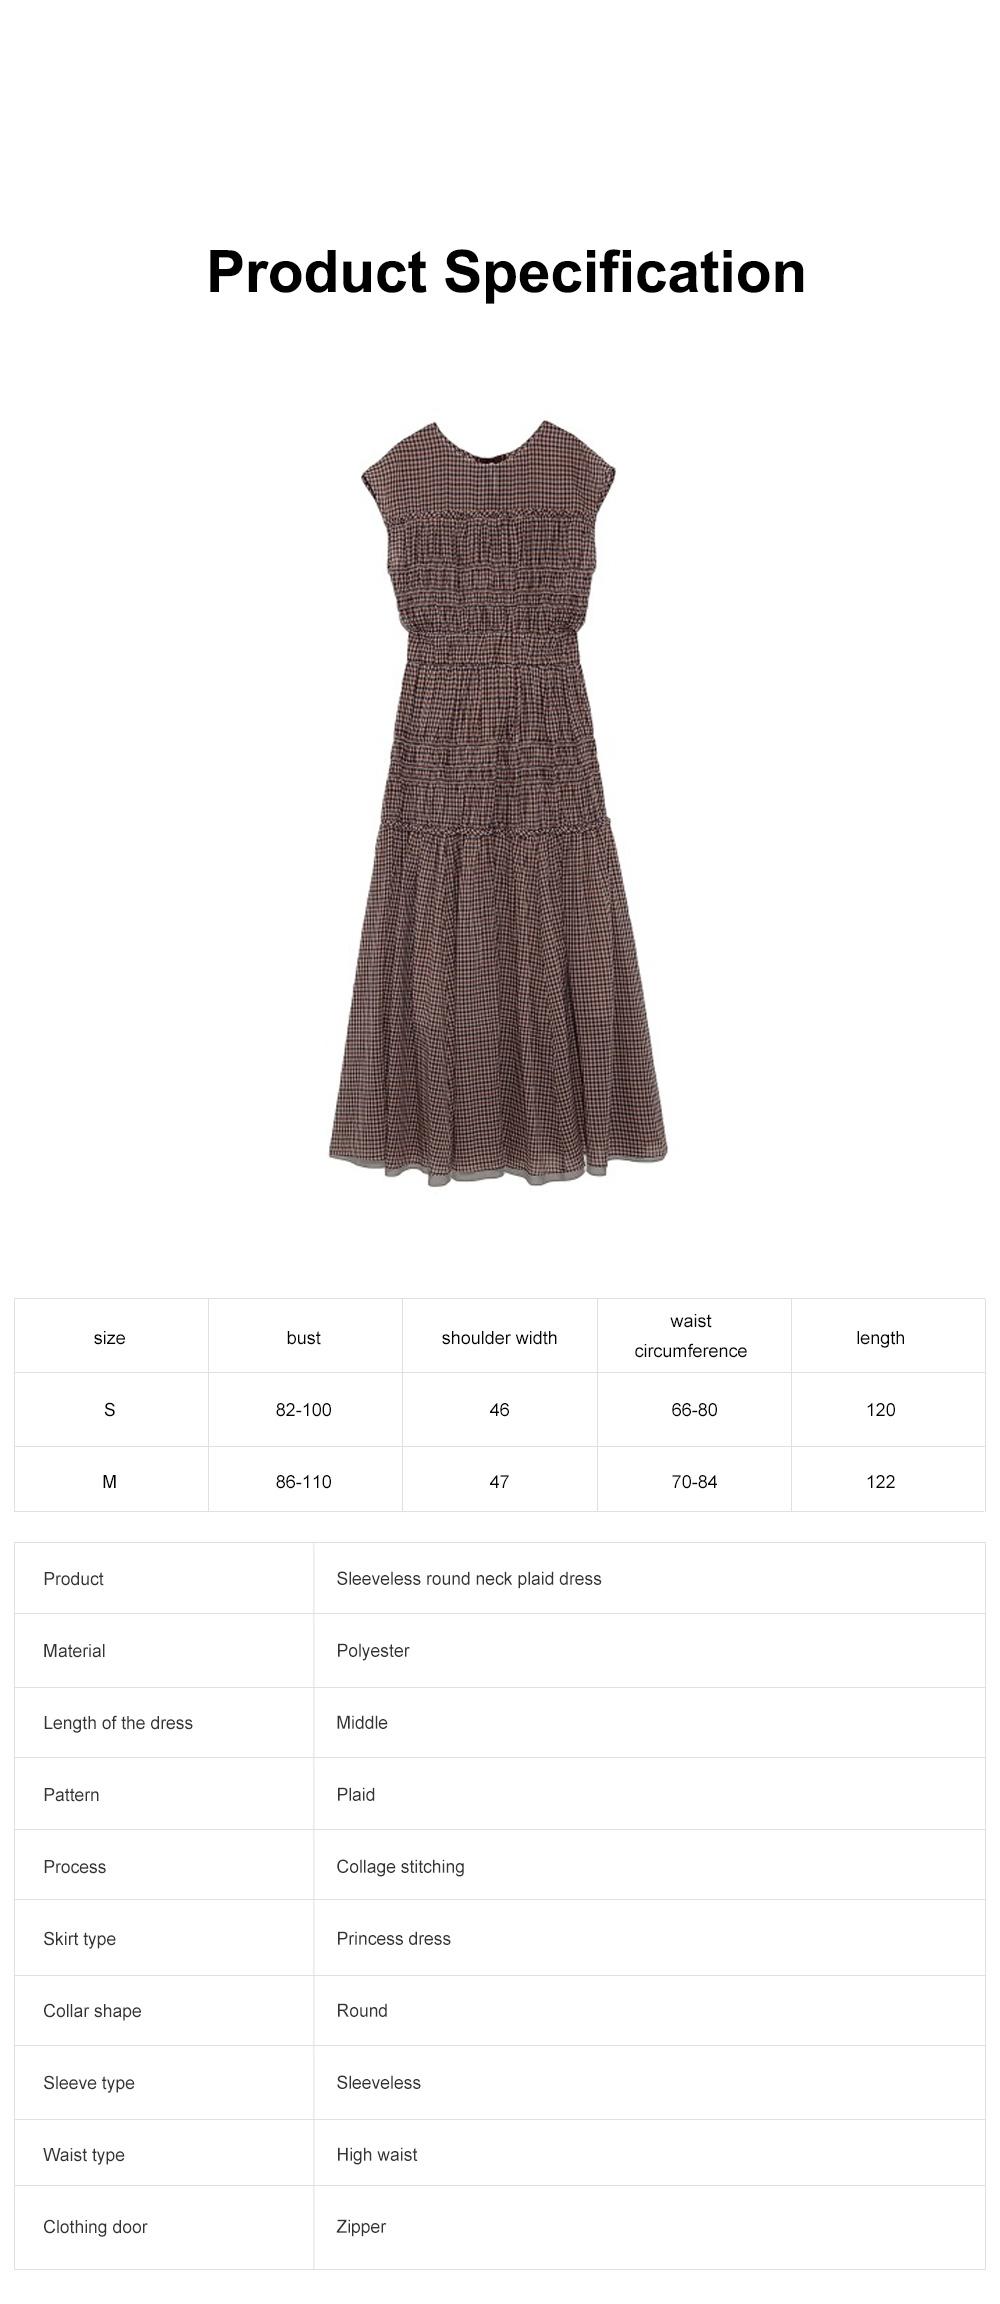 Female Vintage Dress Summer New Sleeveless Round Neck Plaid Women Elegant Thin Pleated Waist Casual Dress 6